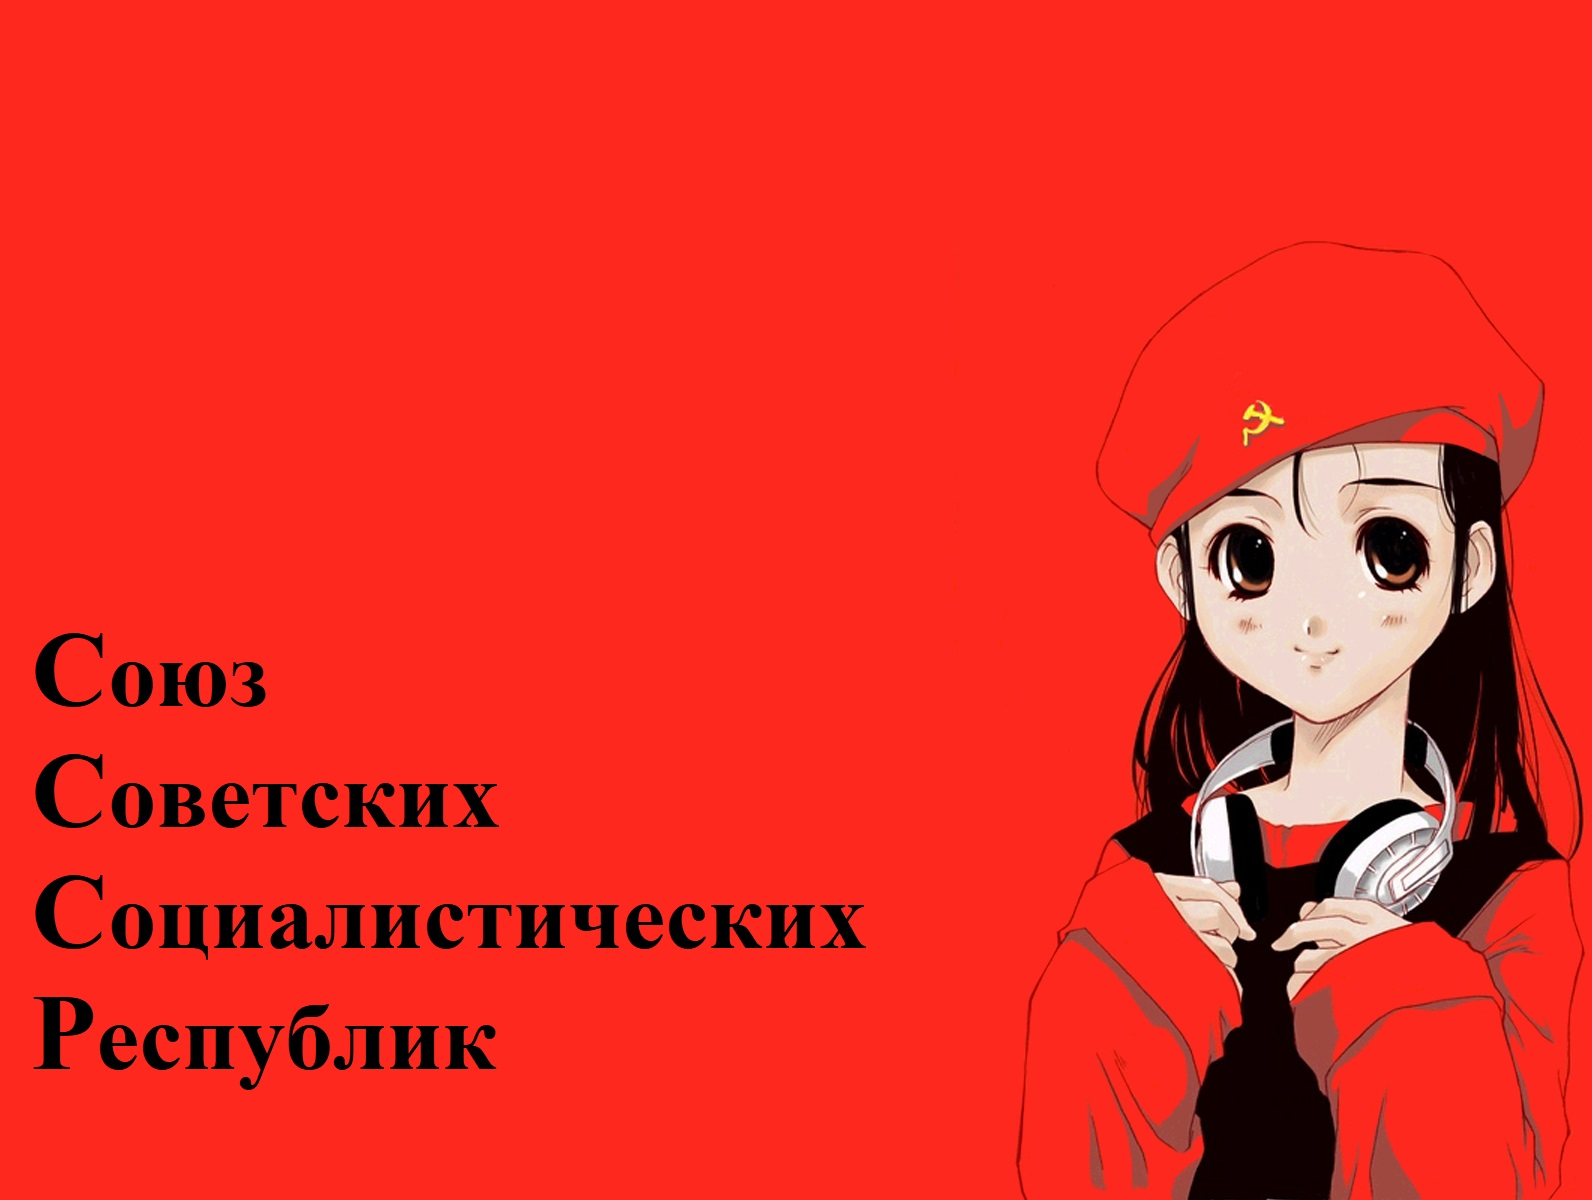 Sticker cccp urss communiste anime fille drapeau kikoojap musique